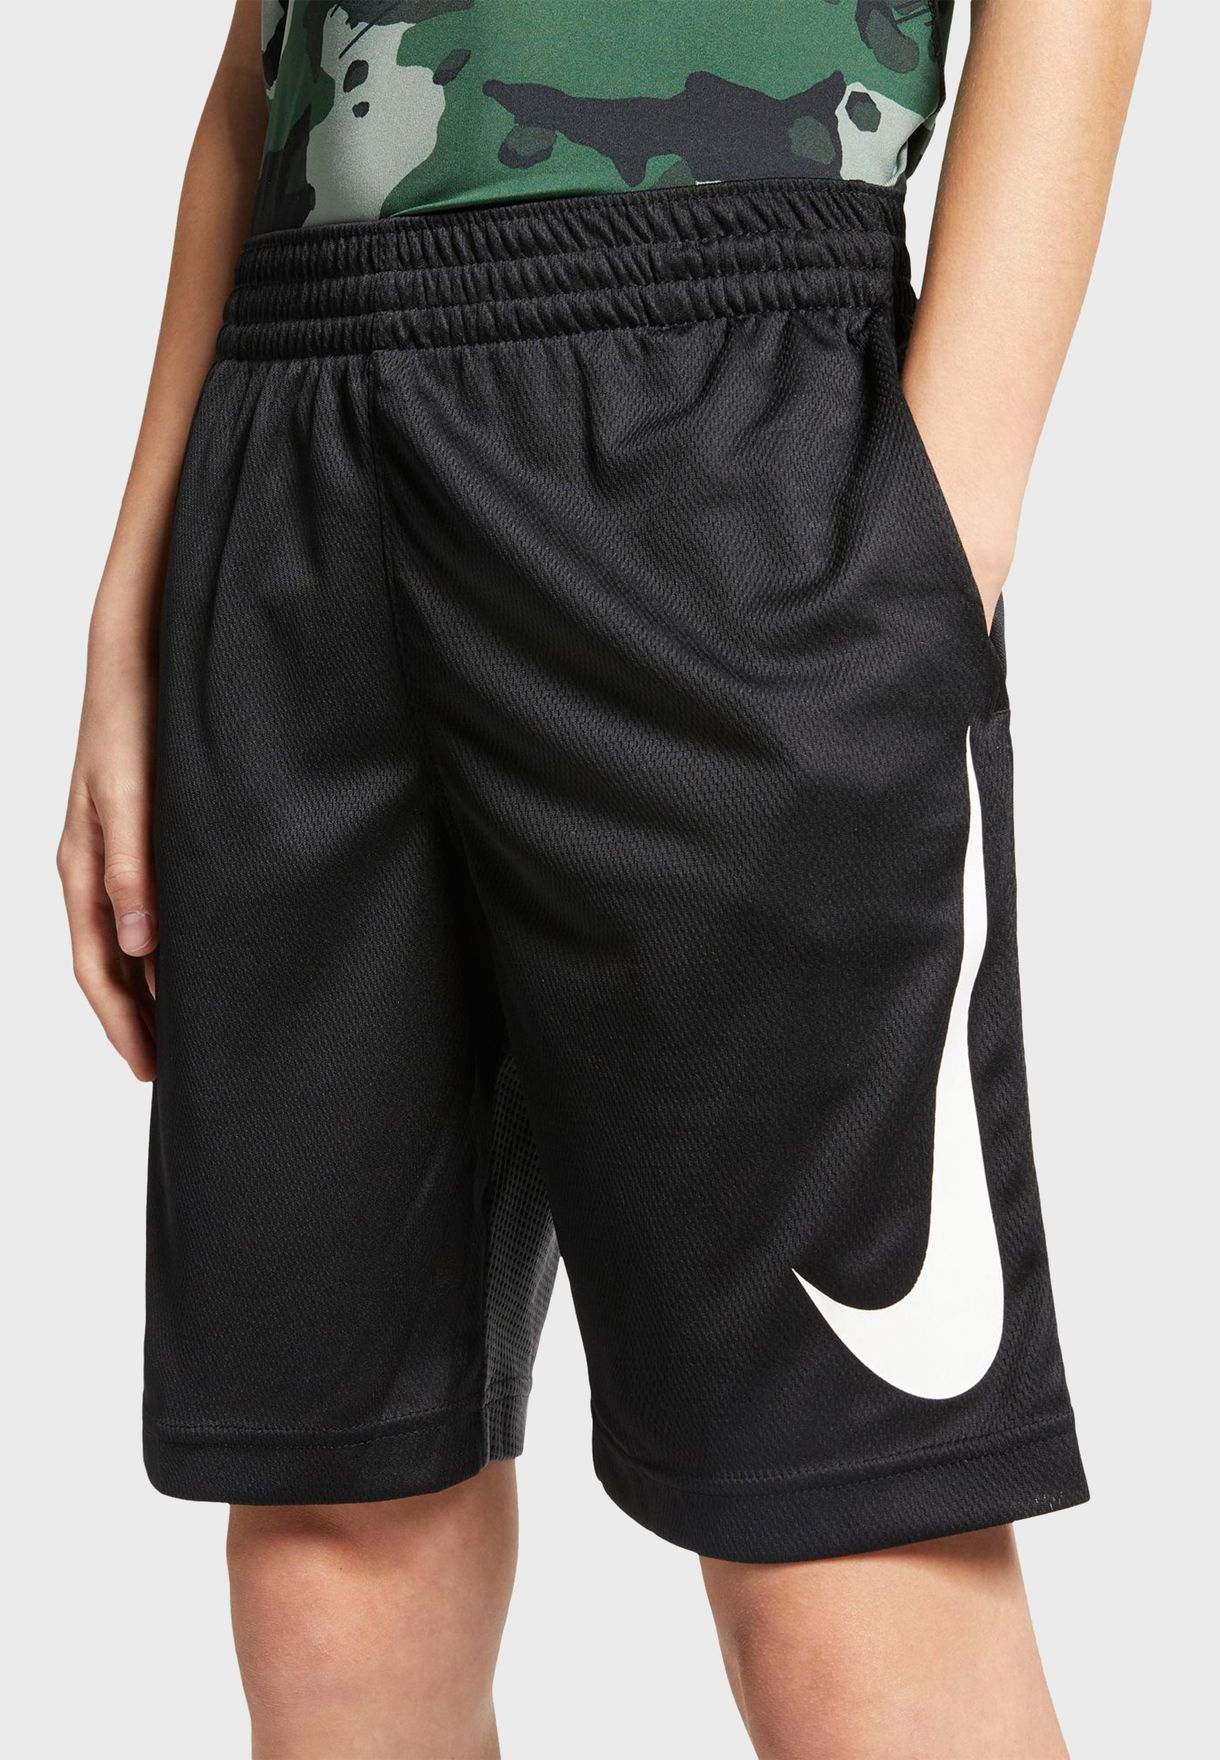 Youth Dri-FIT Shorts